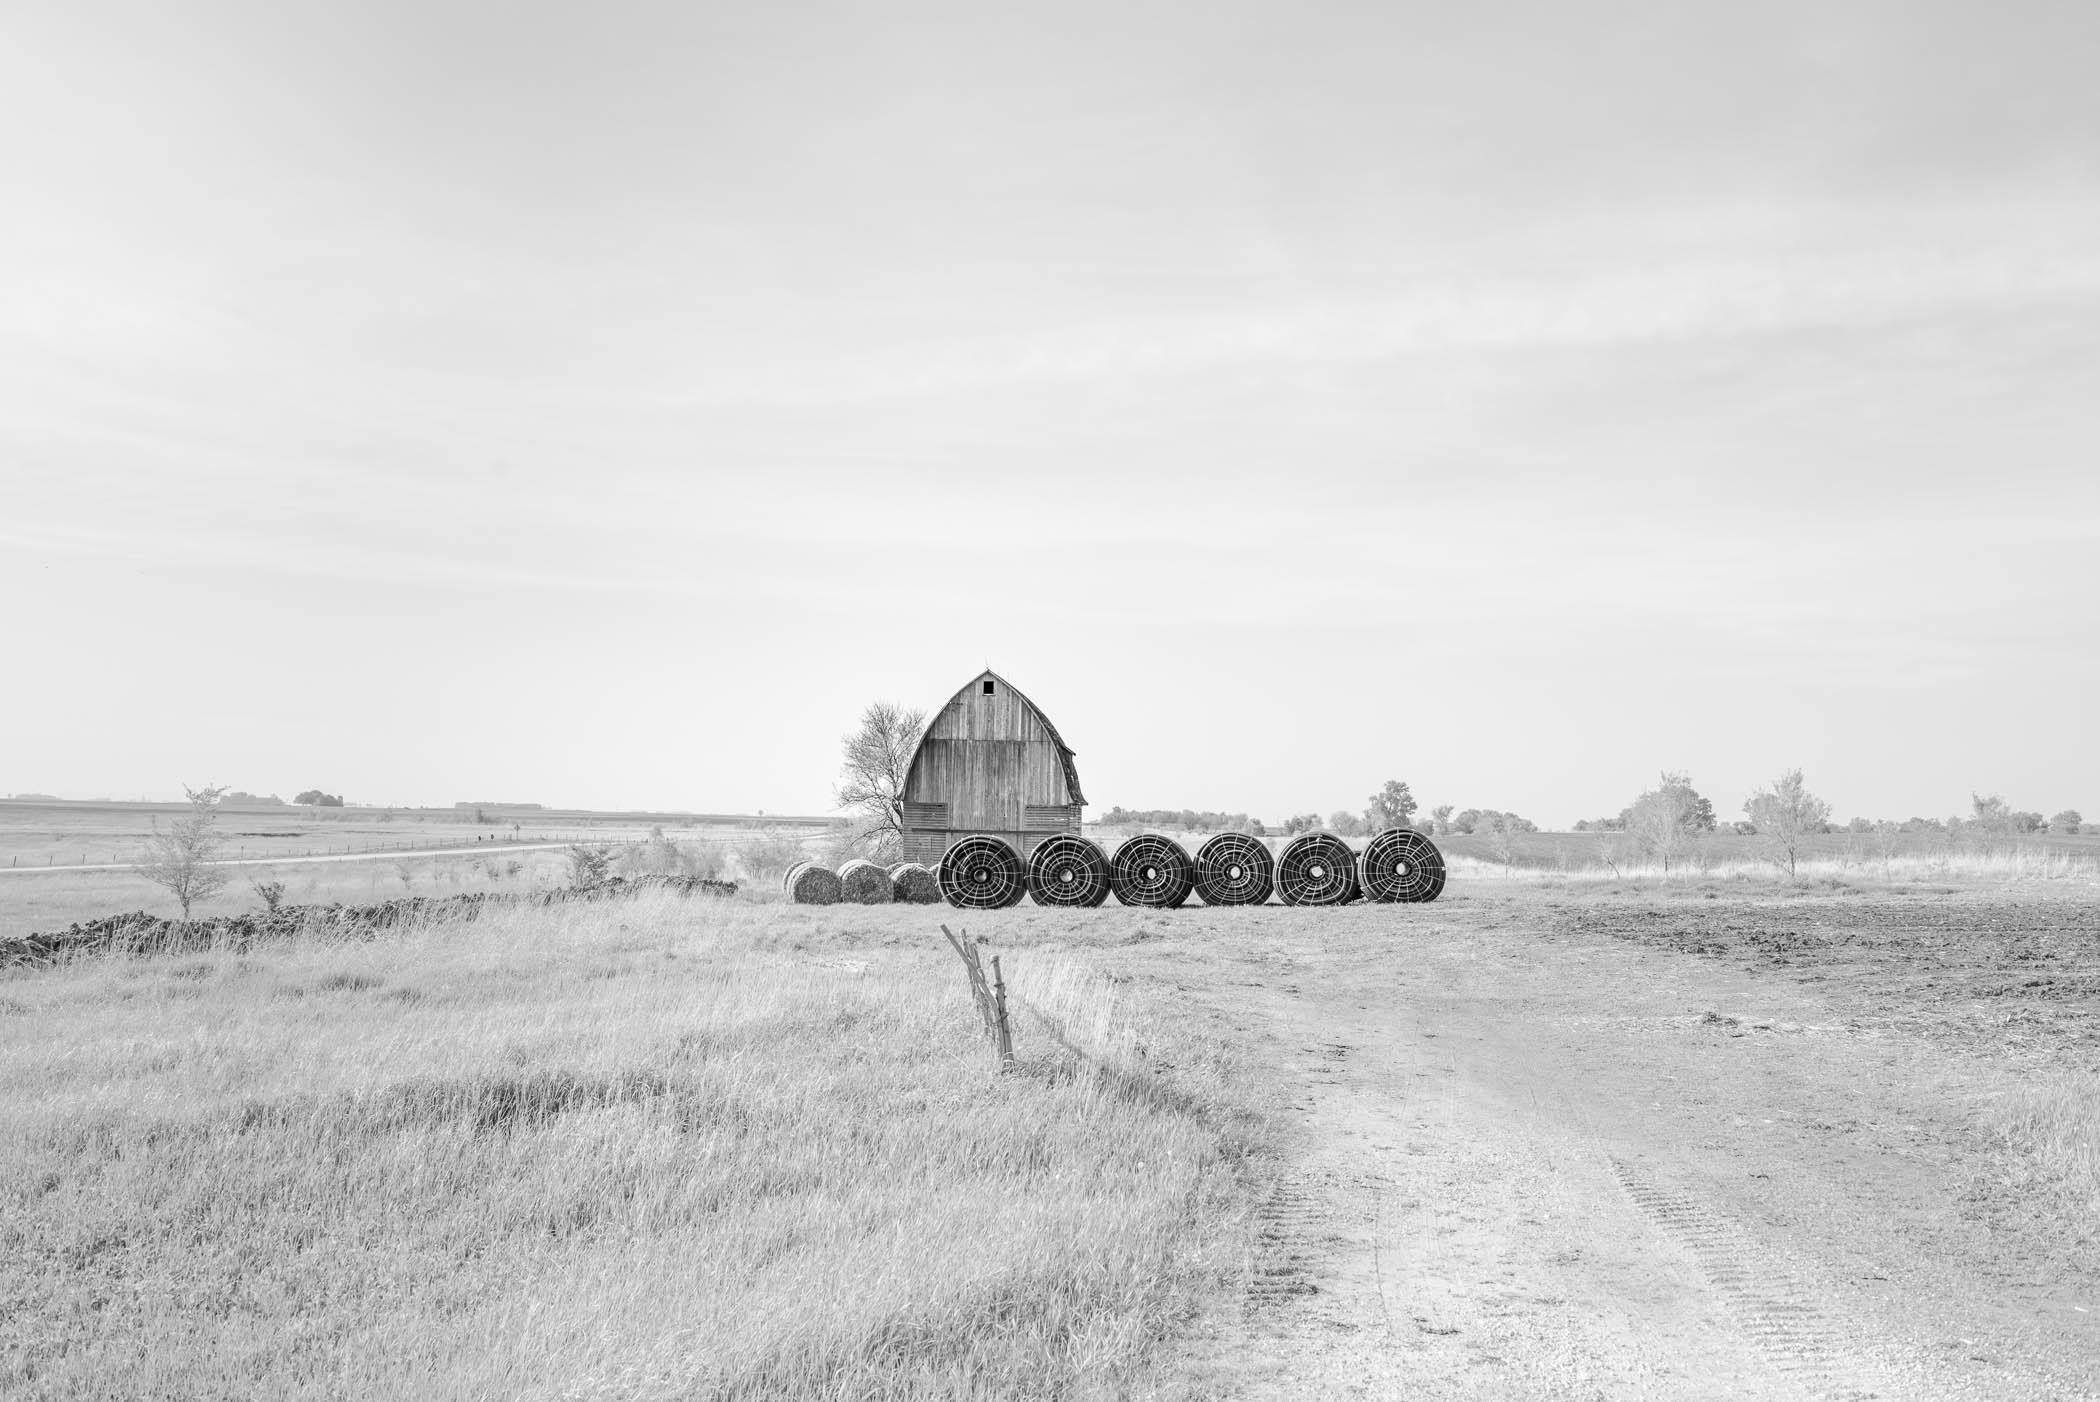 Barn and Bales, South Dakota